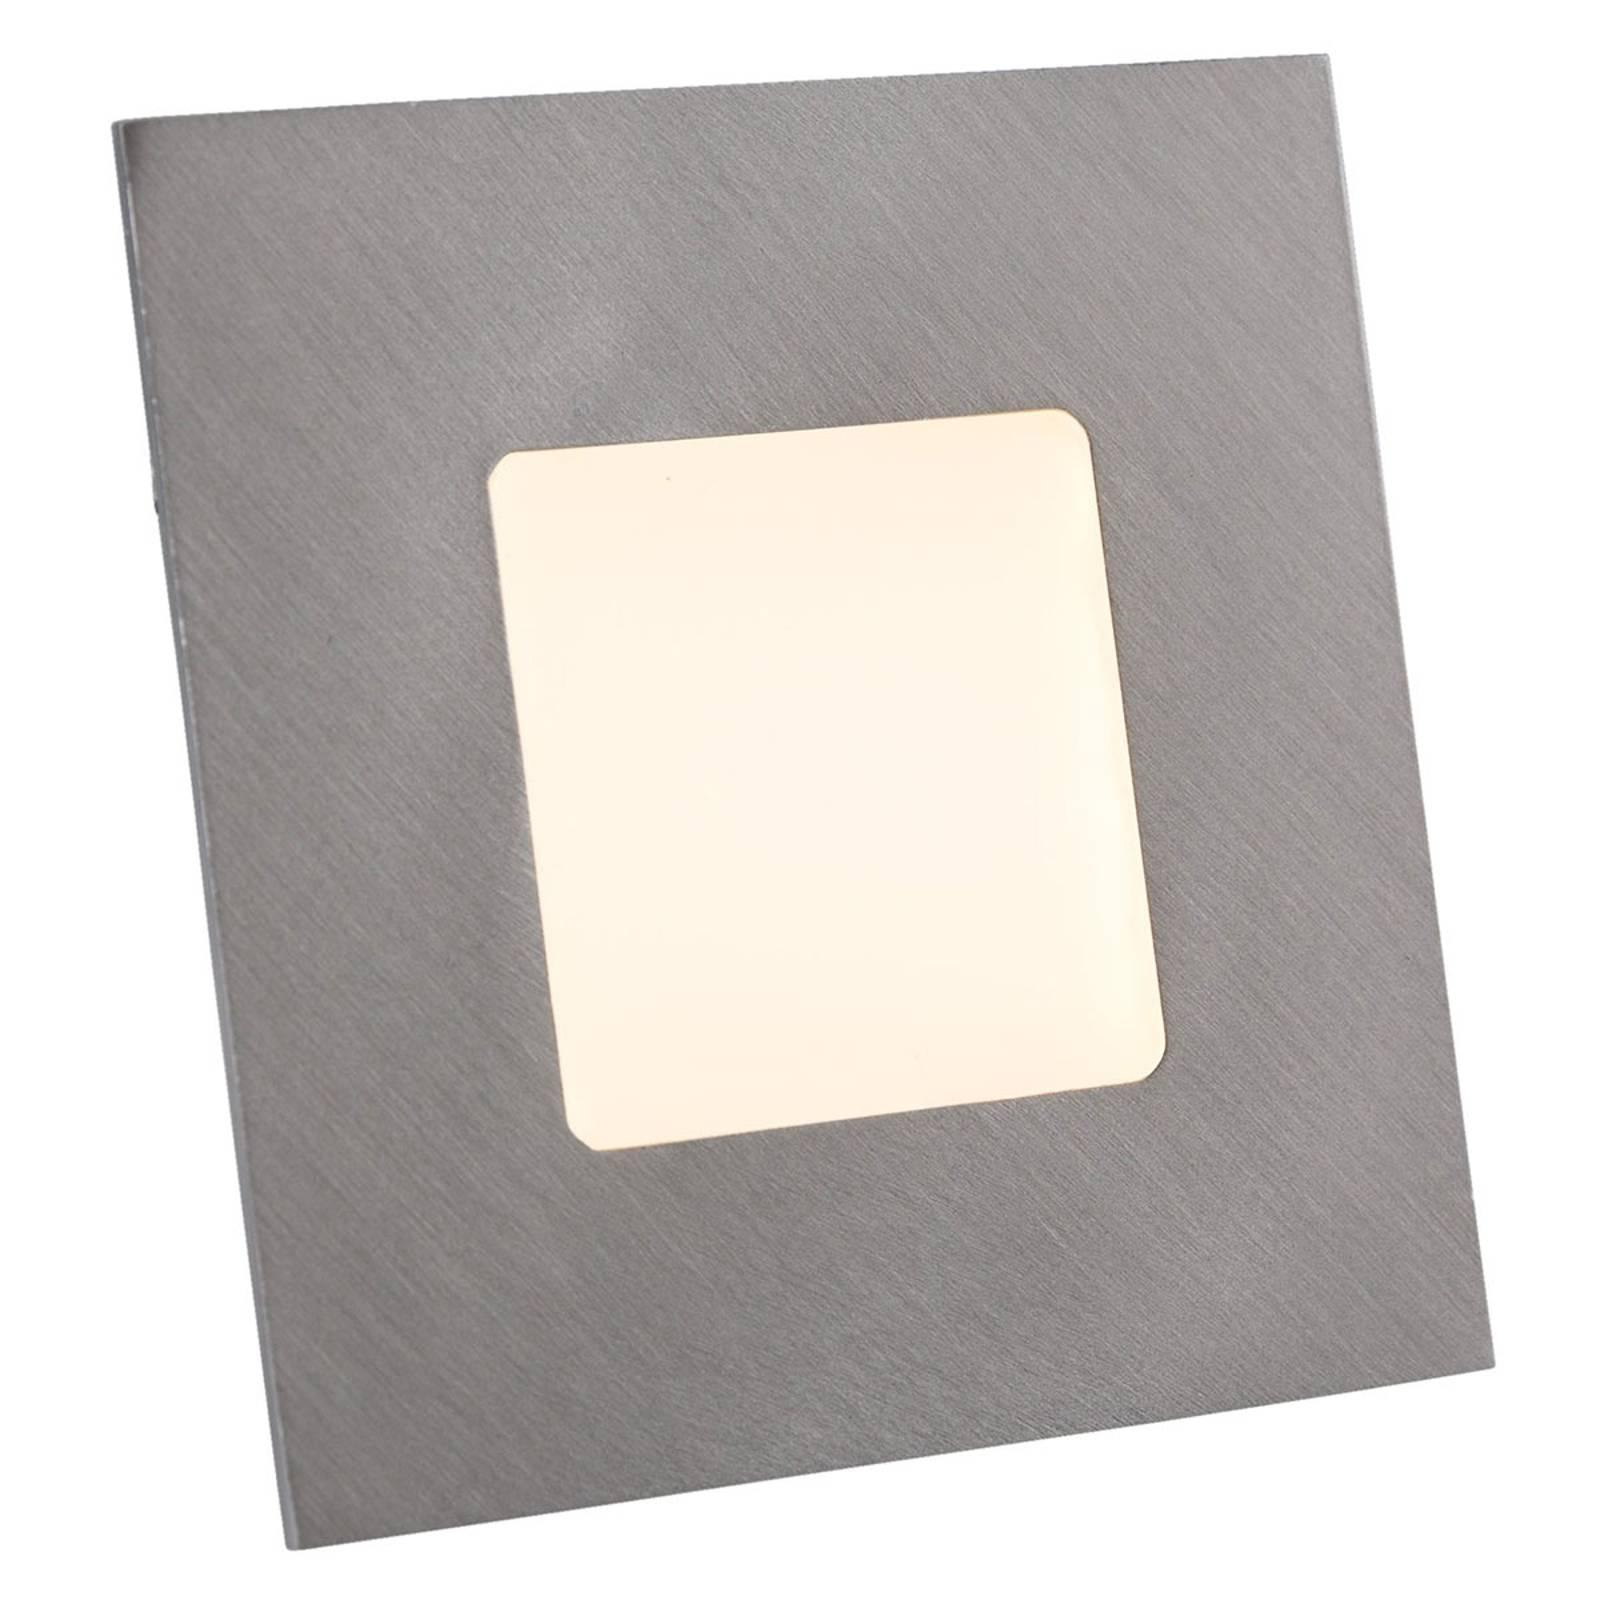 LED-uppovalaisin asennusrasiaan, hopea